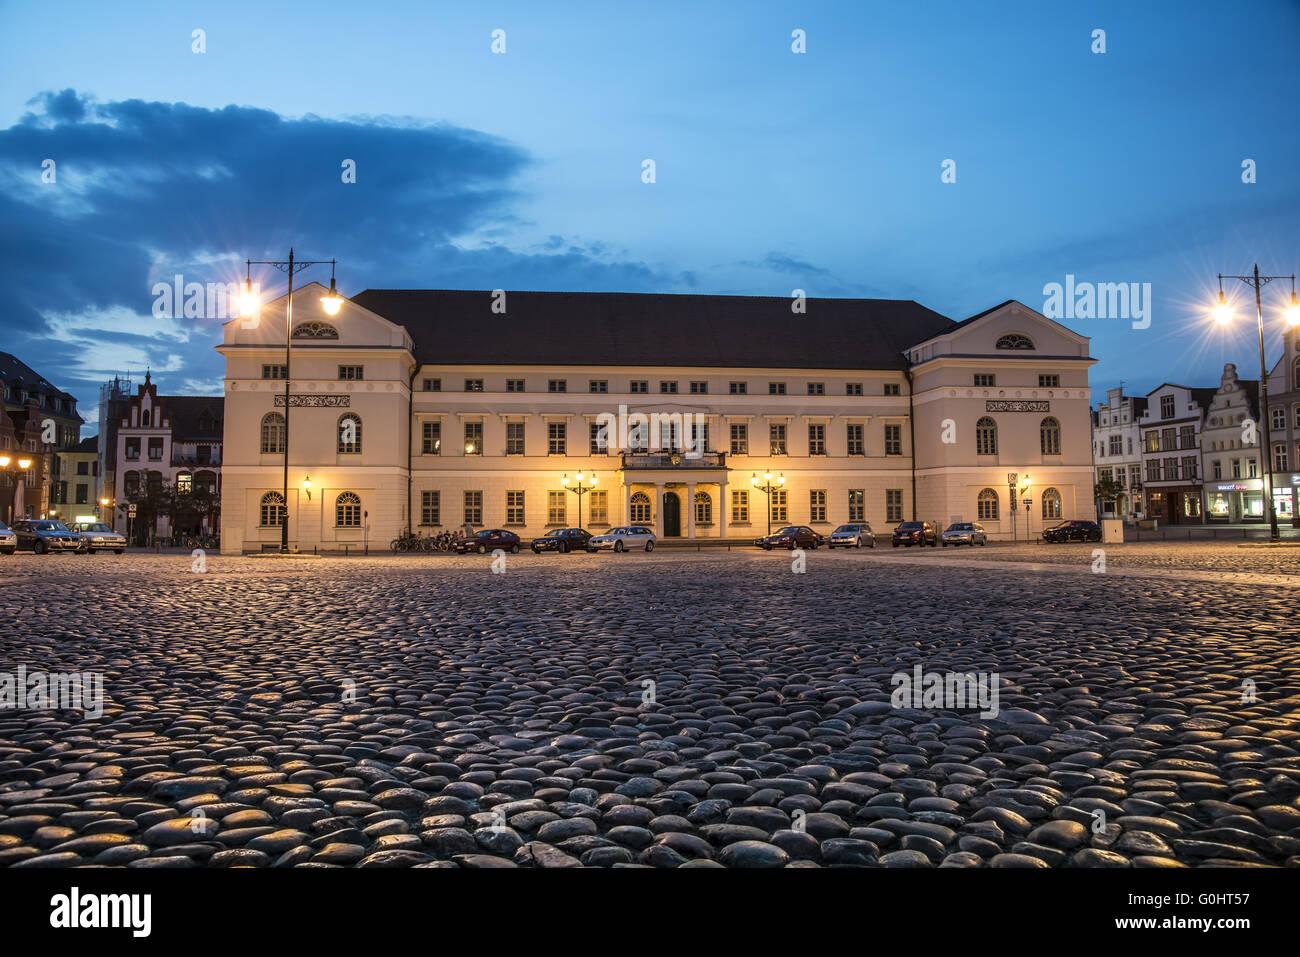 Townhall Wismar - Stock Image